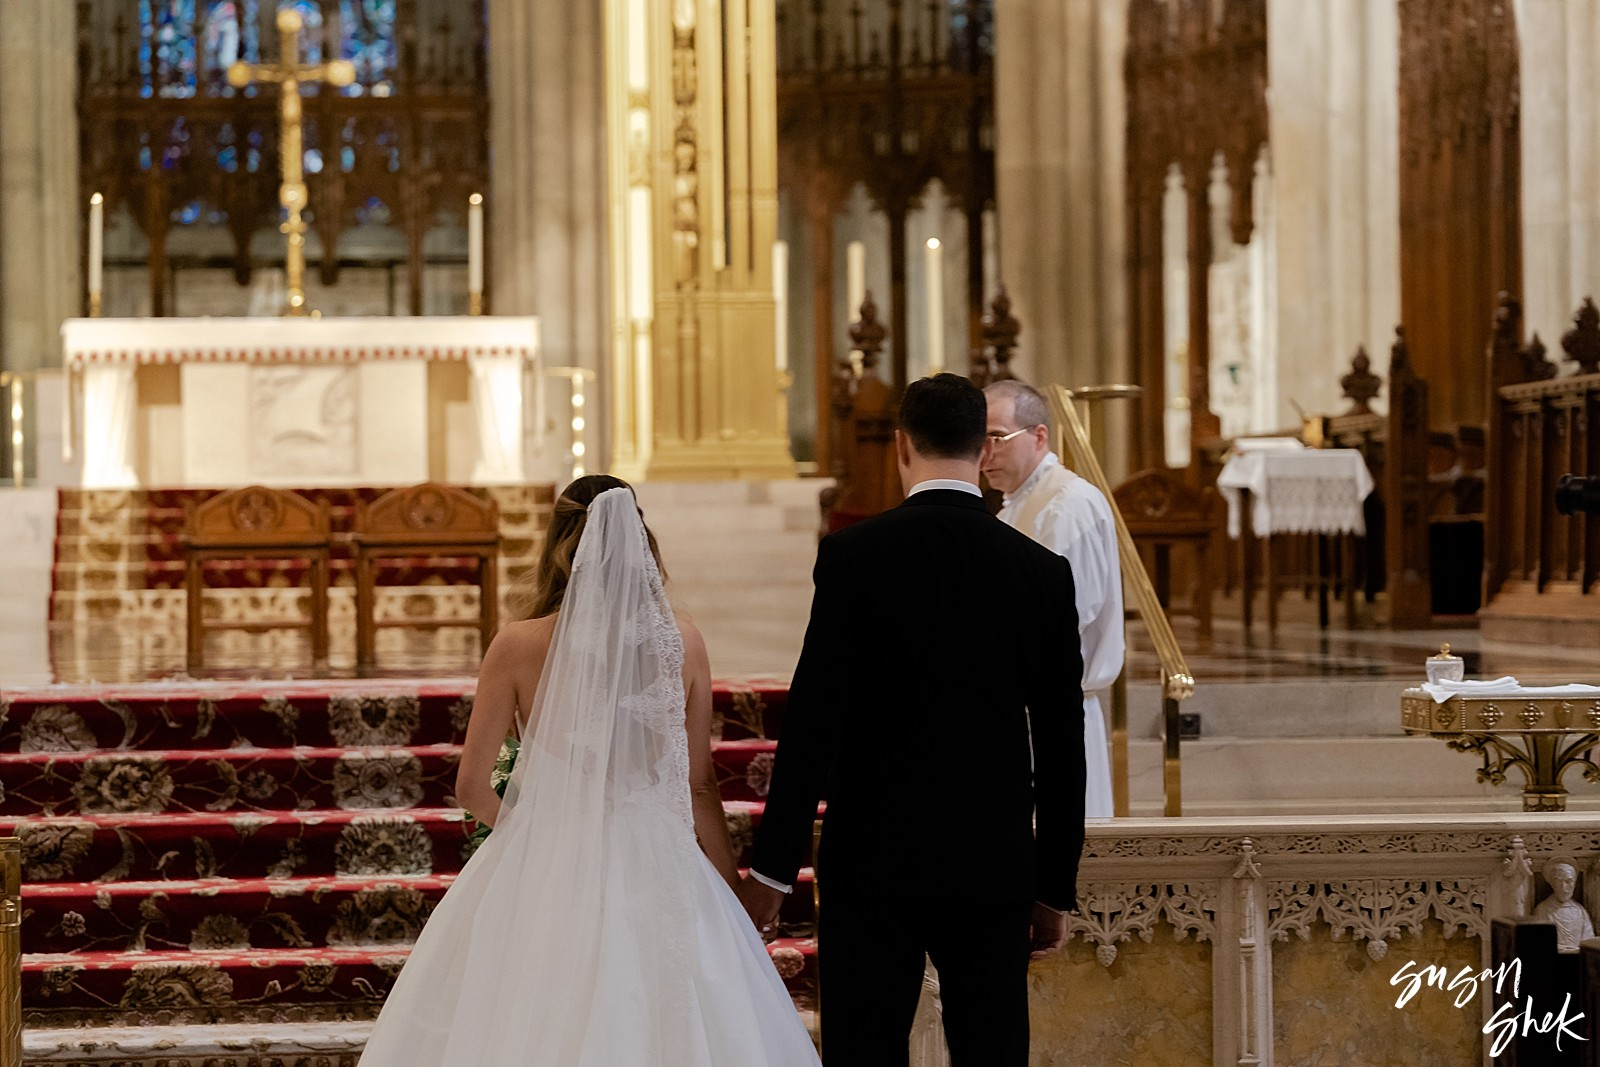 st patricks cathedral wedding, st patricks cathedral, wedding at st patricks cathedral, new york wedding., nyc wedding photographer, wedding photographer, st pats, st patrick cathedral